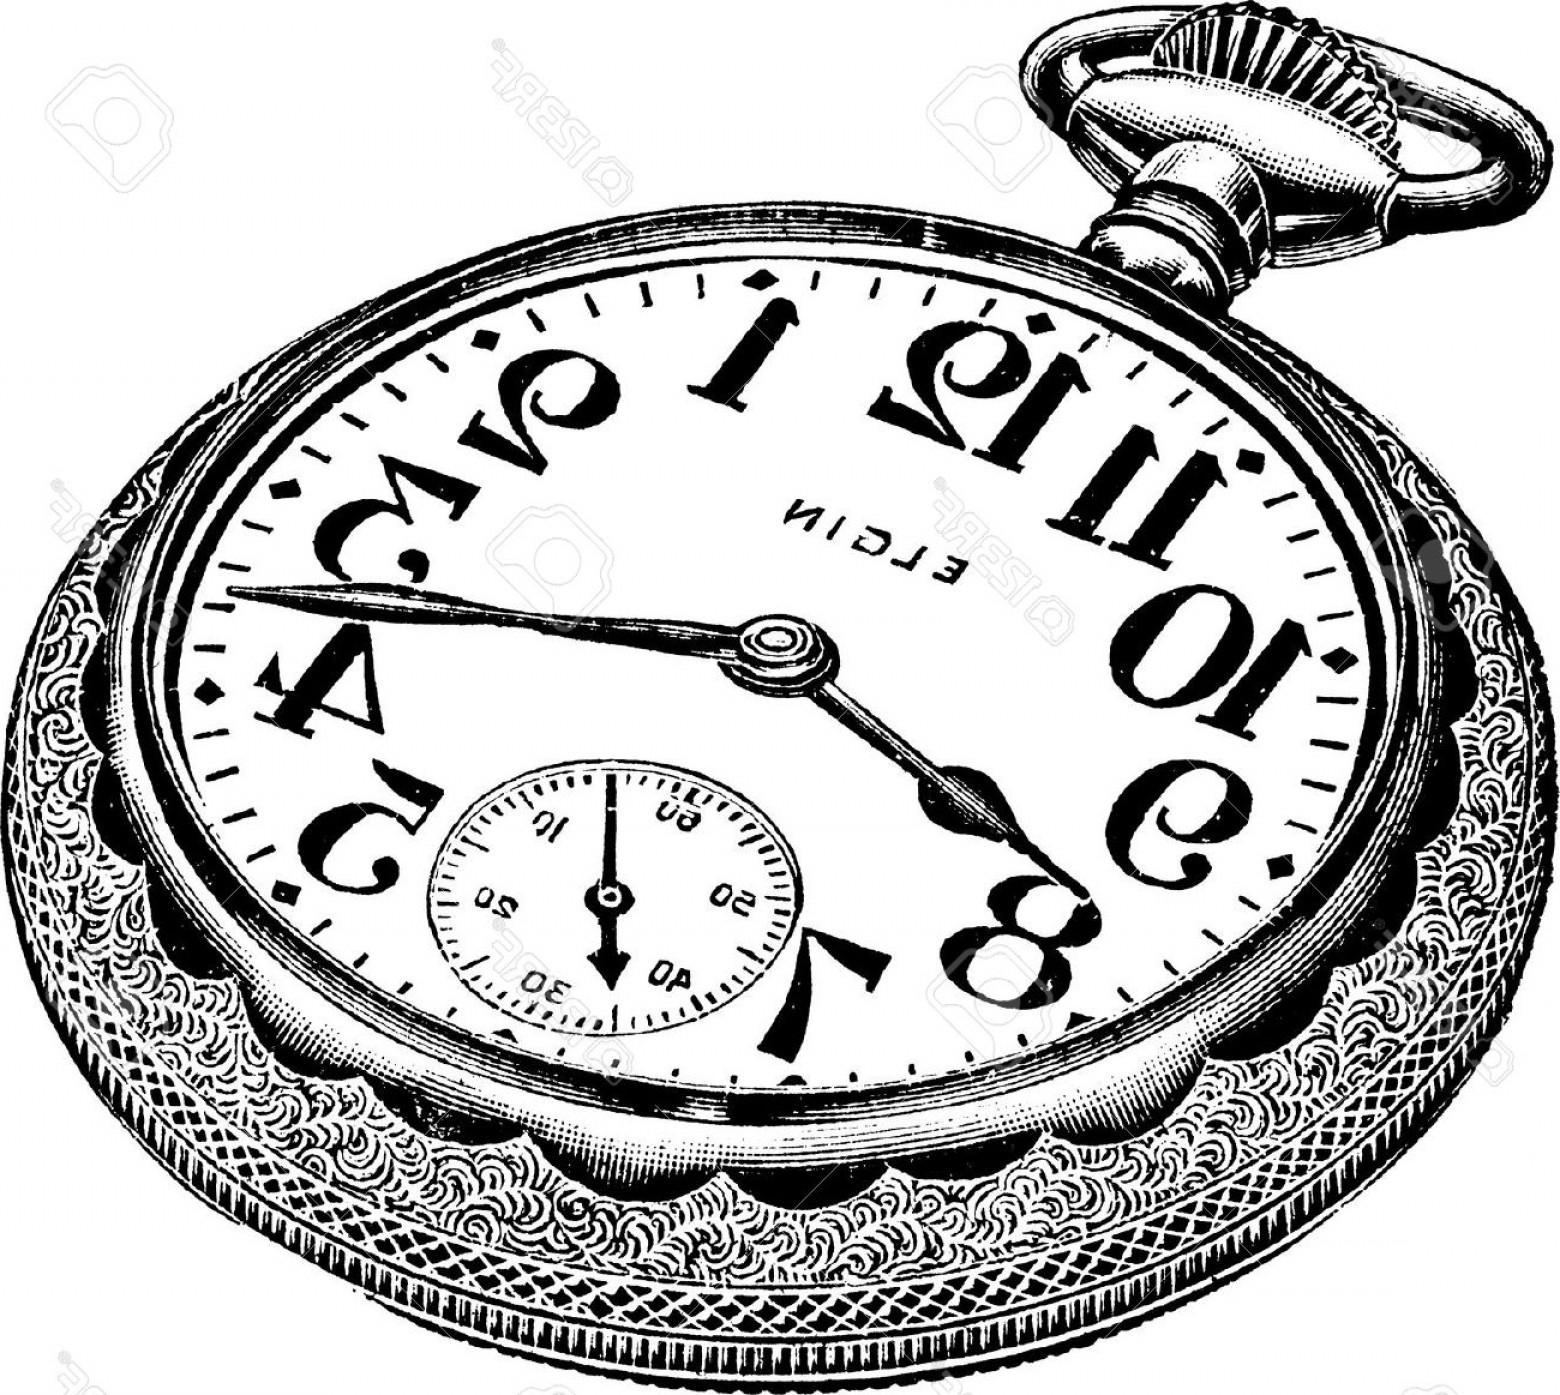 1560x1395 Pocket Watch Line Drawing Steampunk Pocket Watch Drawing